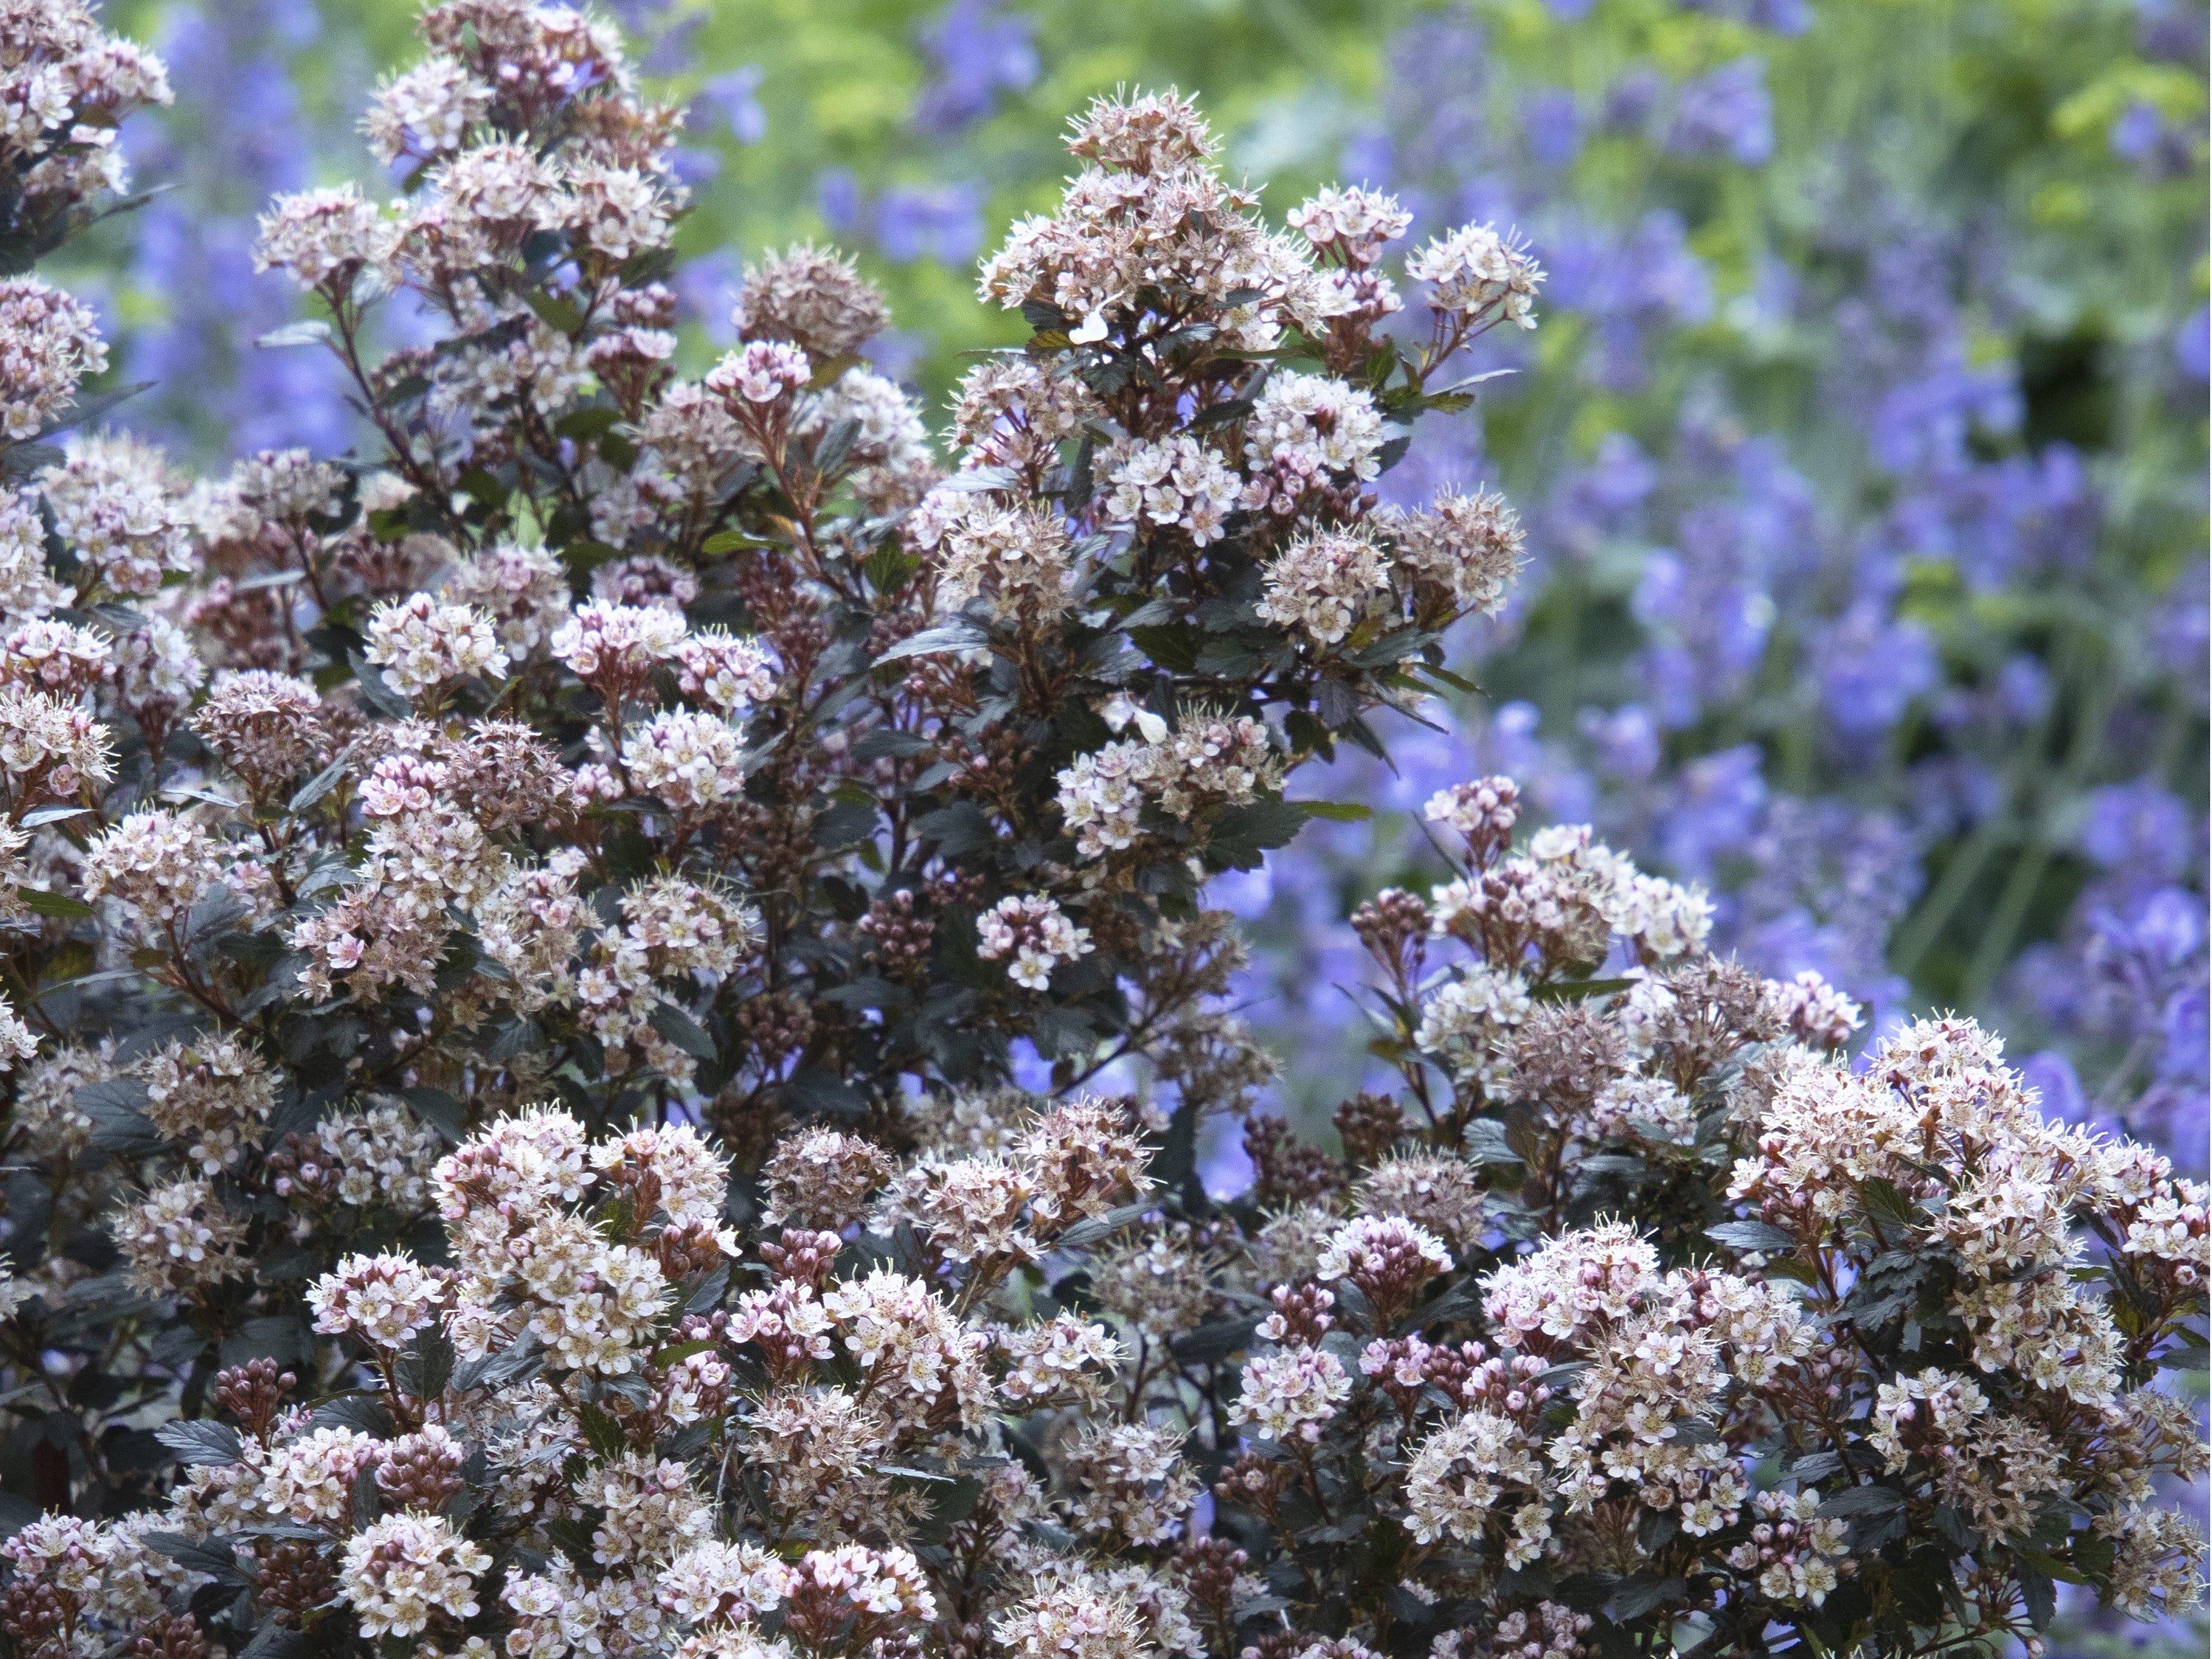 Little Joker Ninebark is a dwarf shrub that gets only 3 to 4 feet tall.